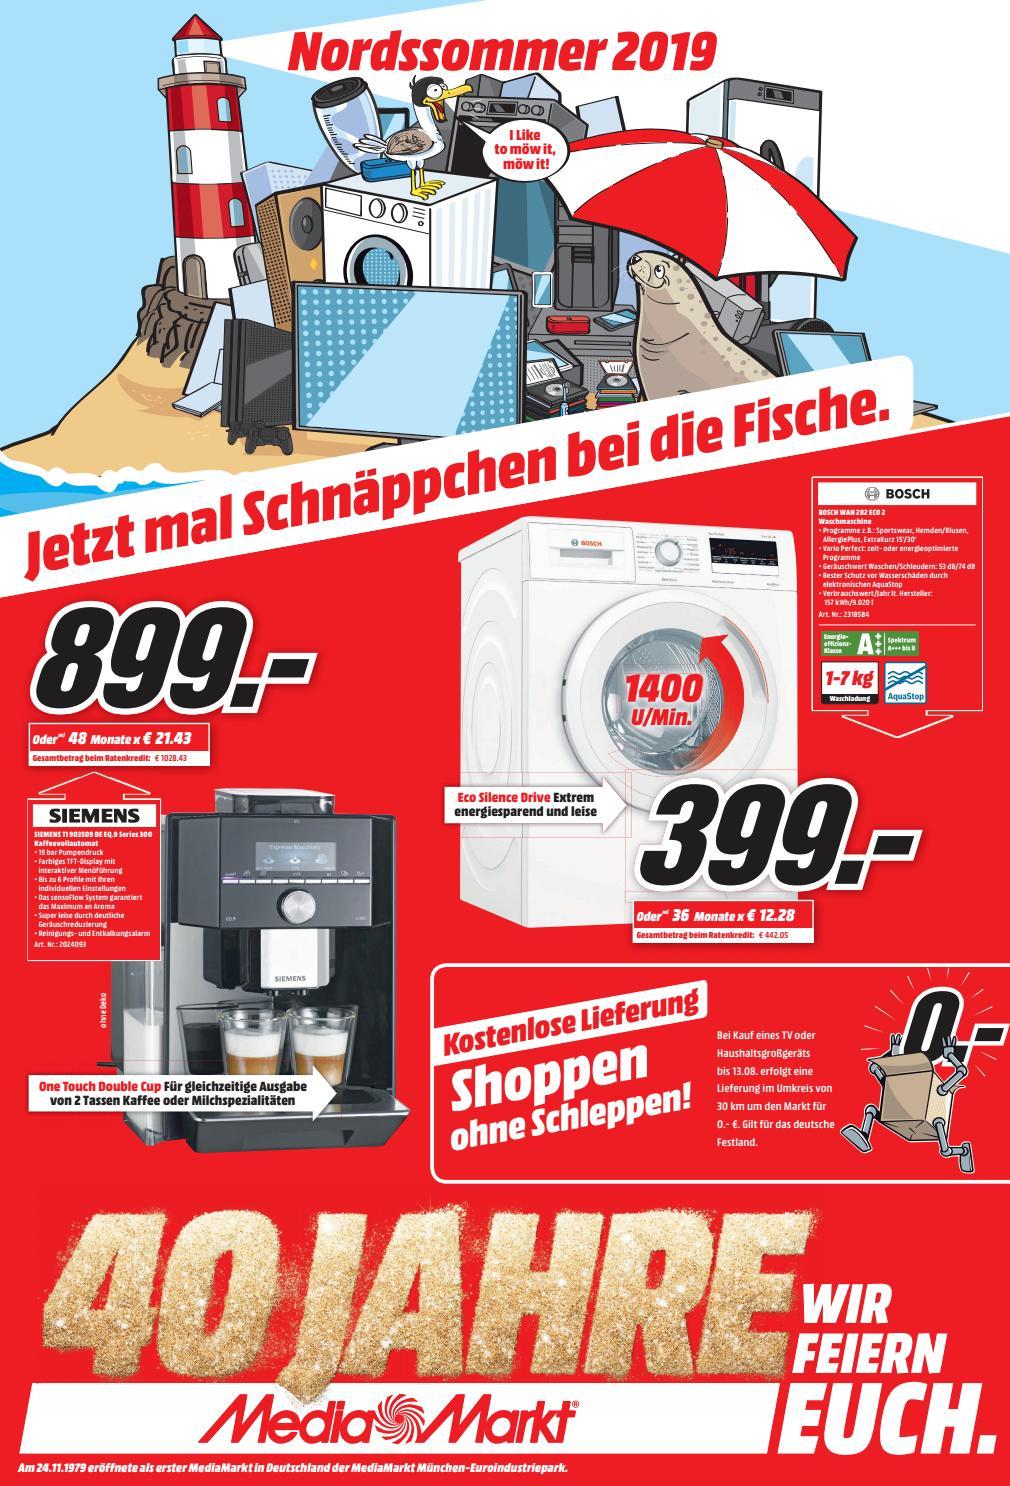 kühlschrank 50 cm breit media markt